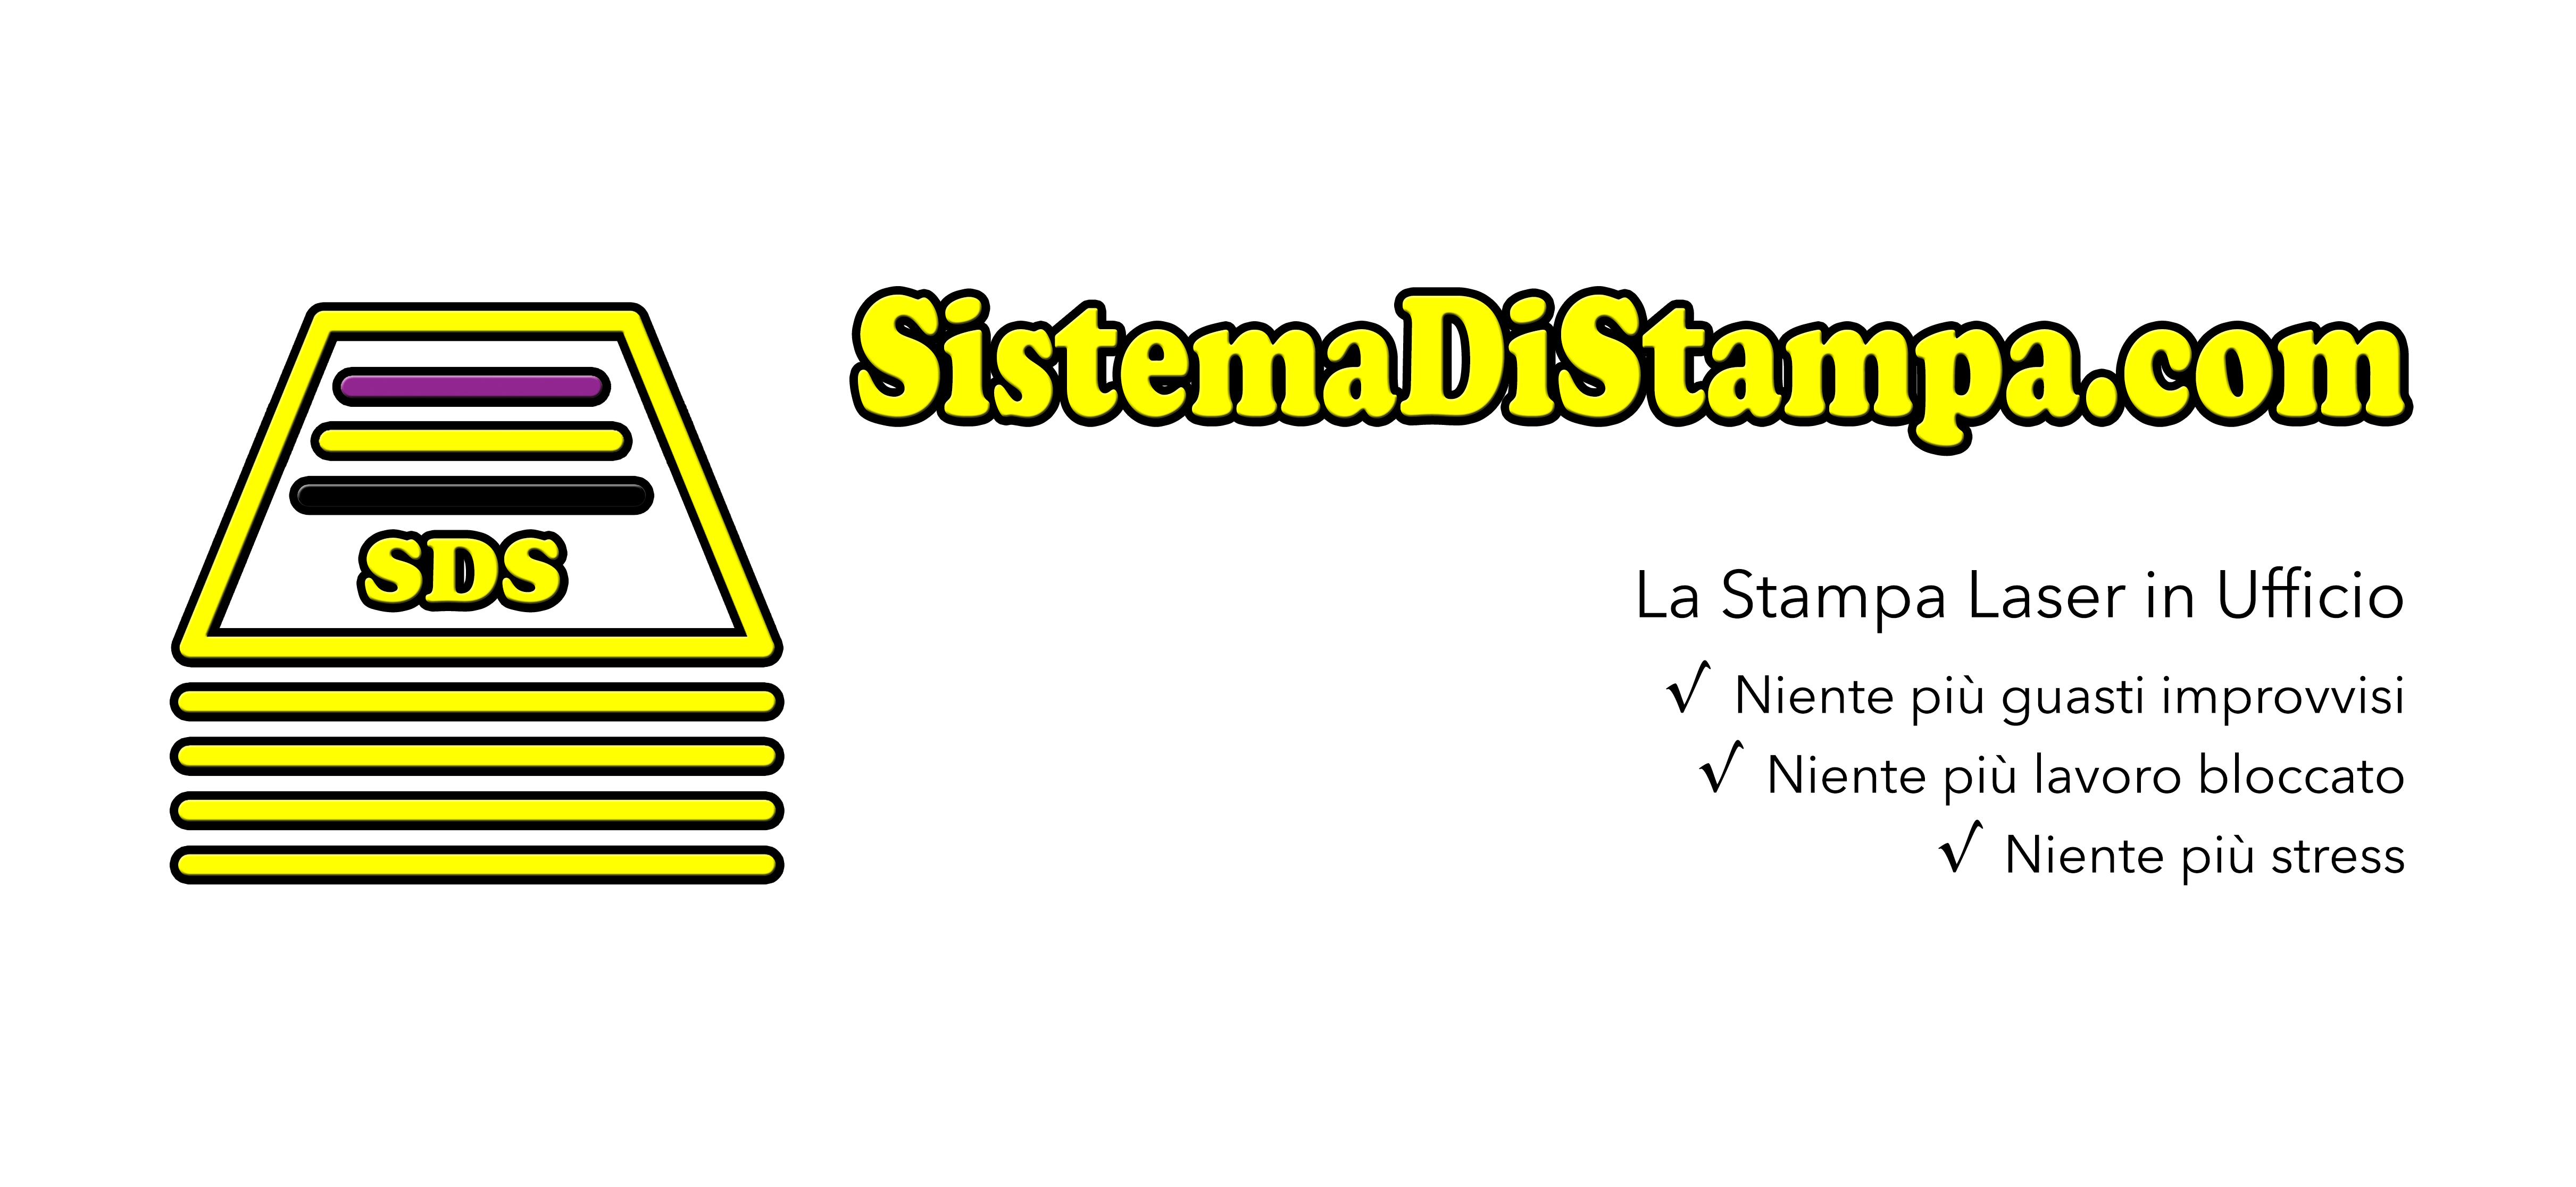 SistemaDiStampa.com